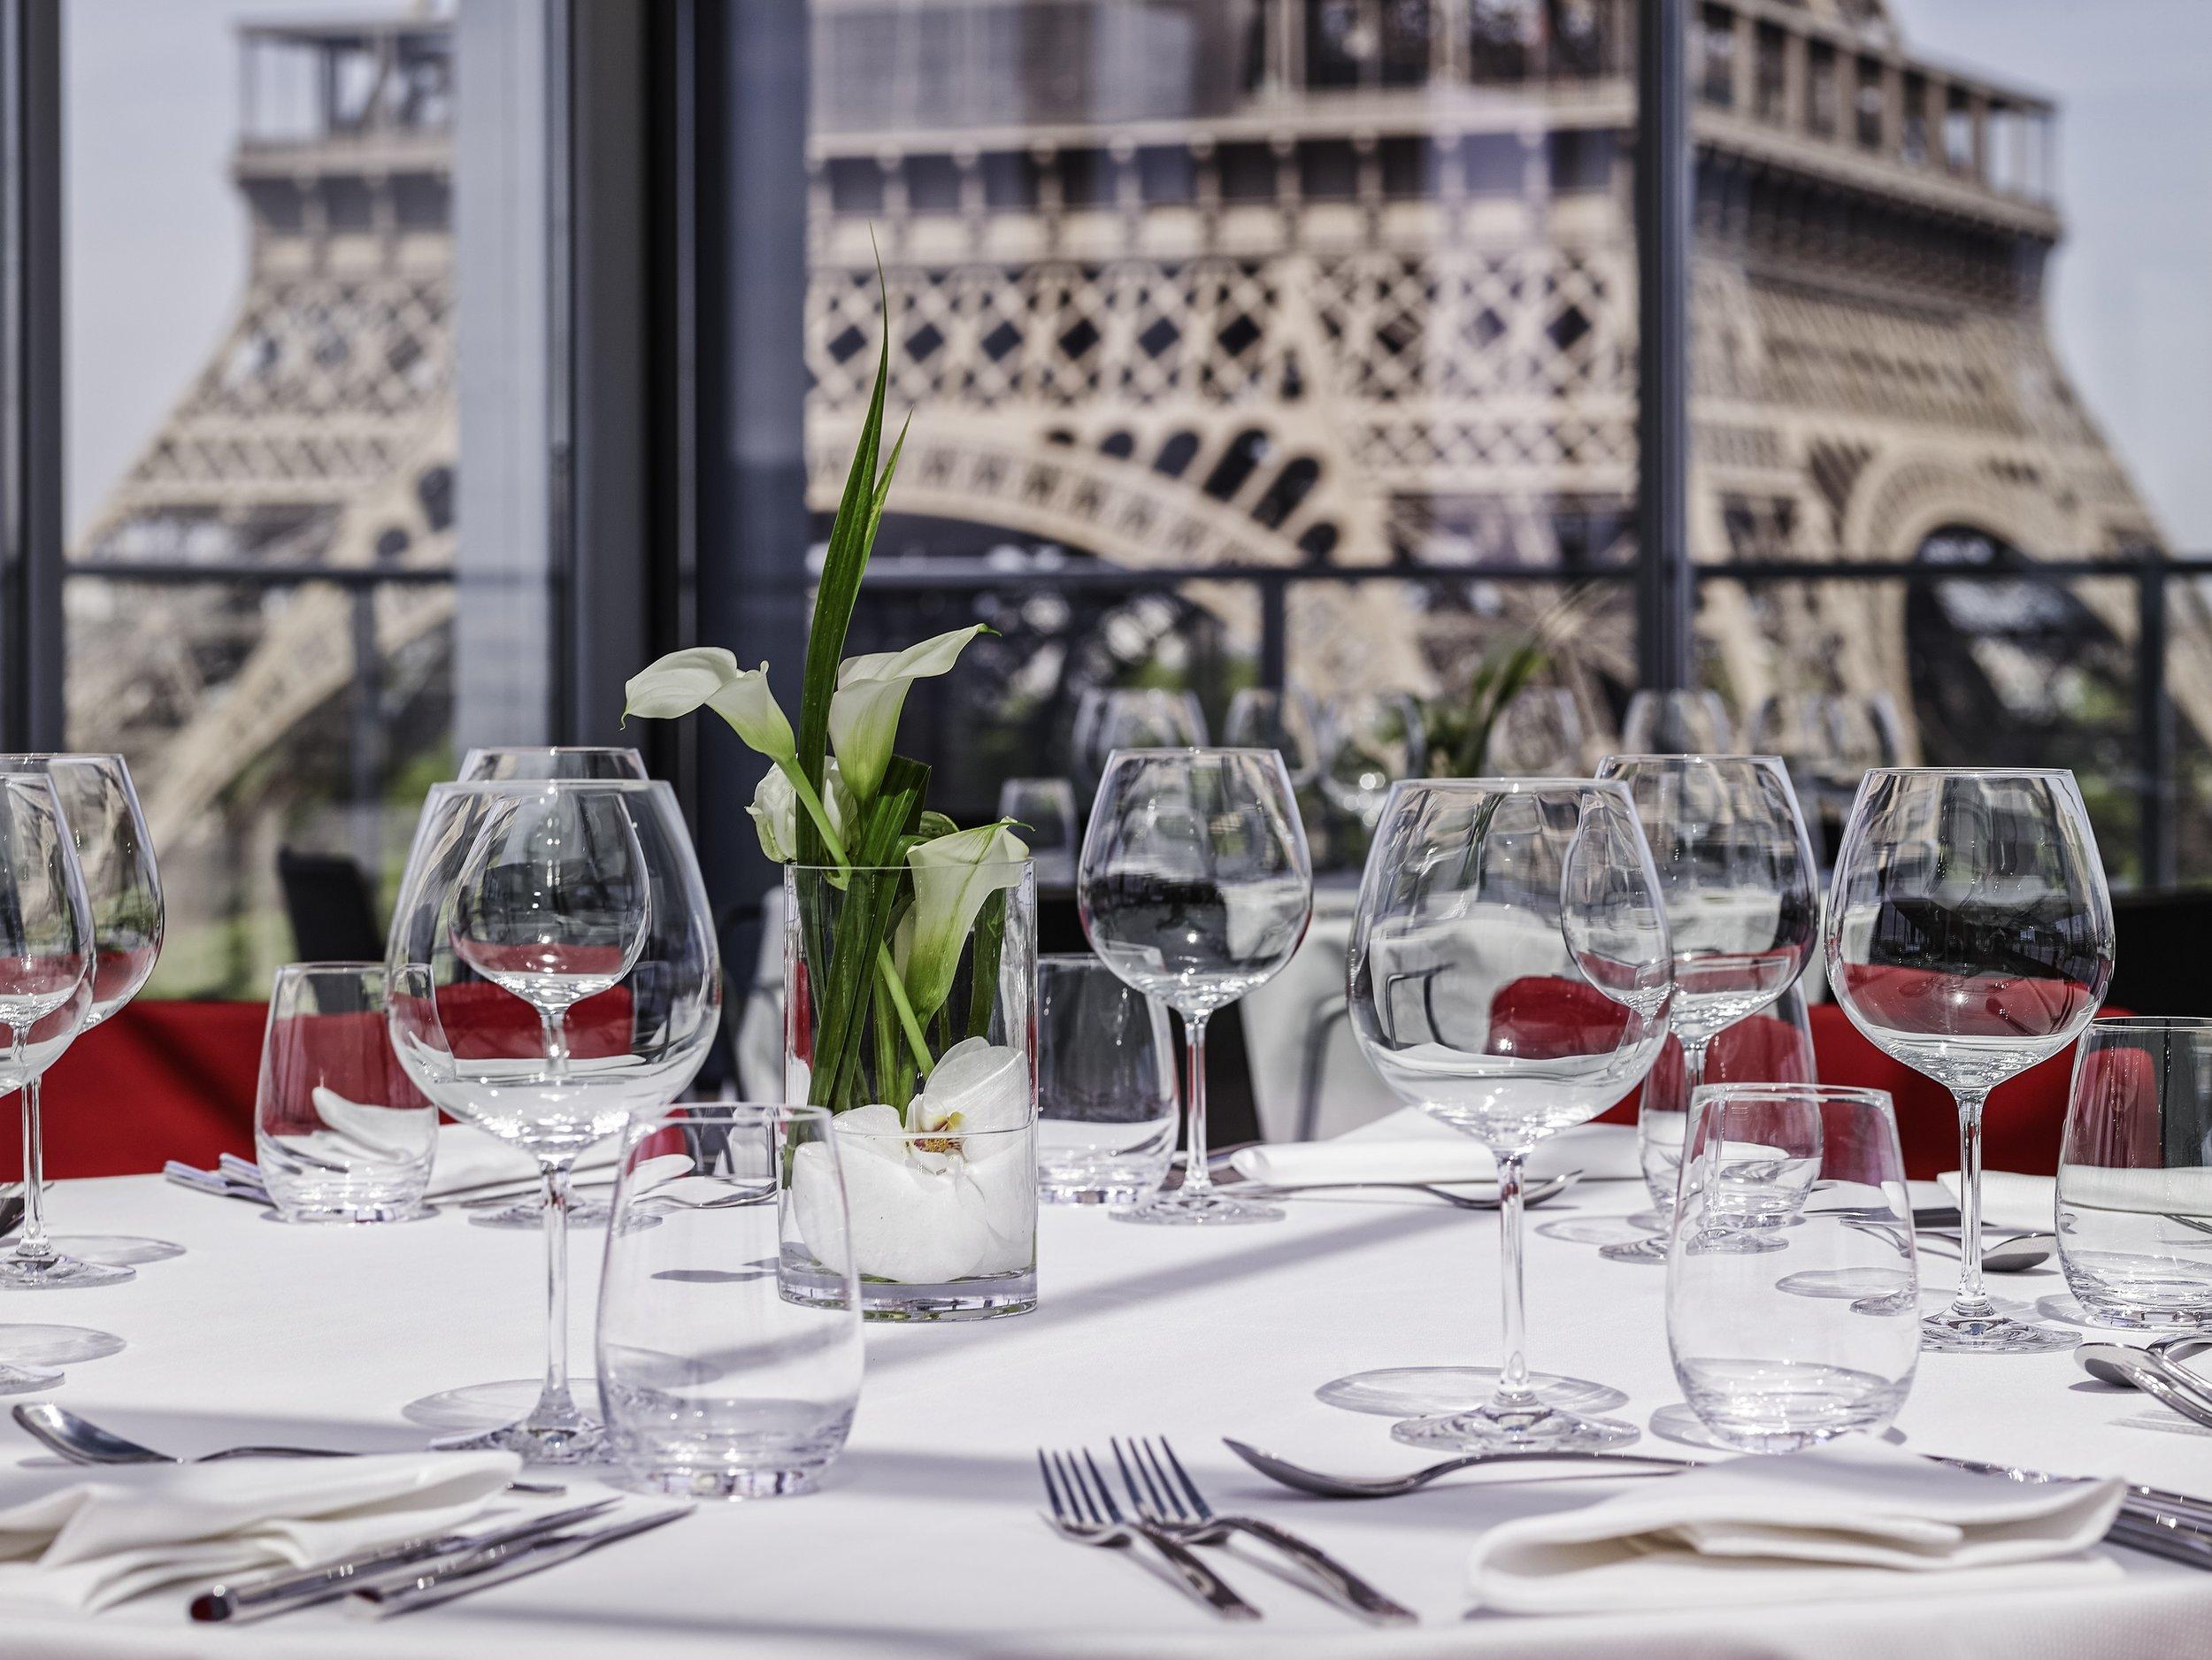 Salon Trocadéro horizontal format banquet 3217-64.jpg